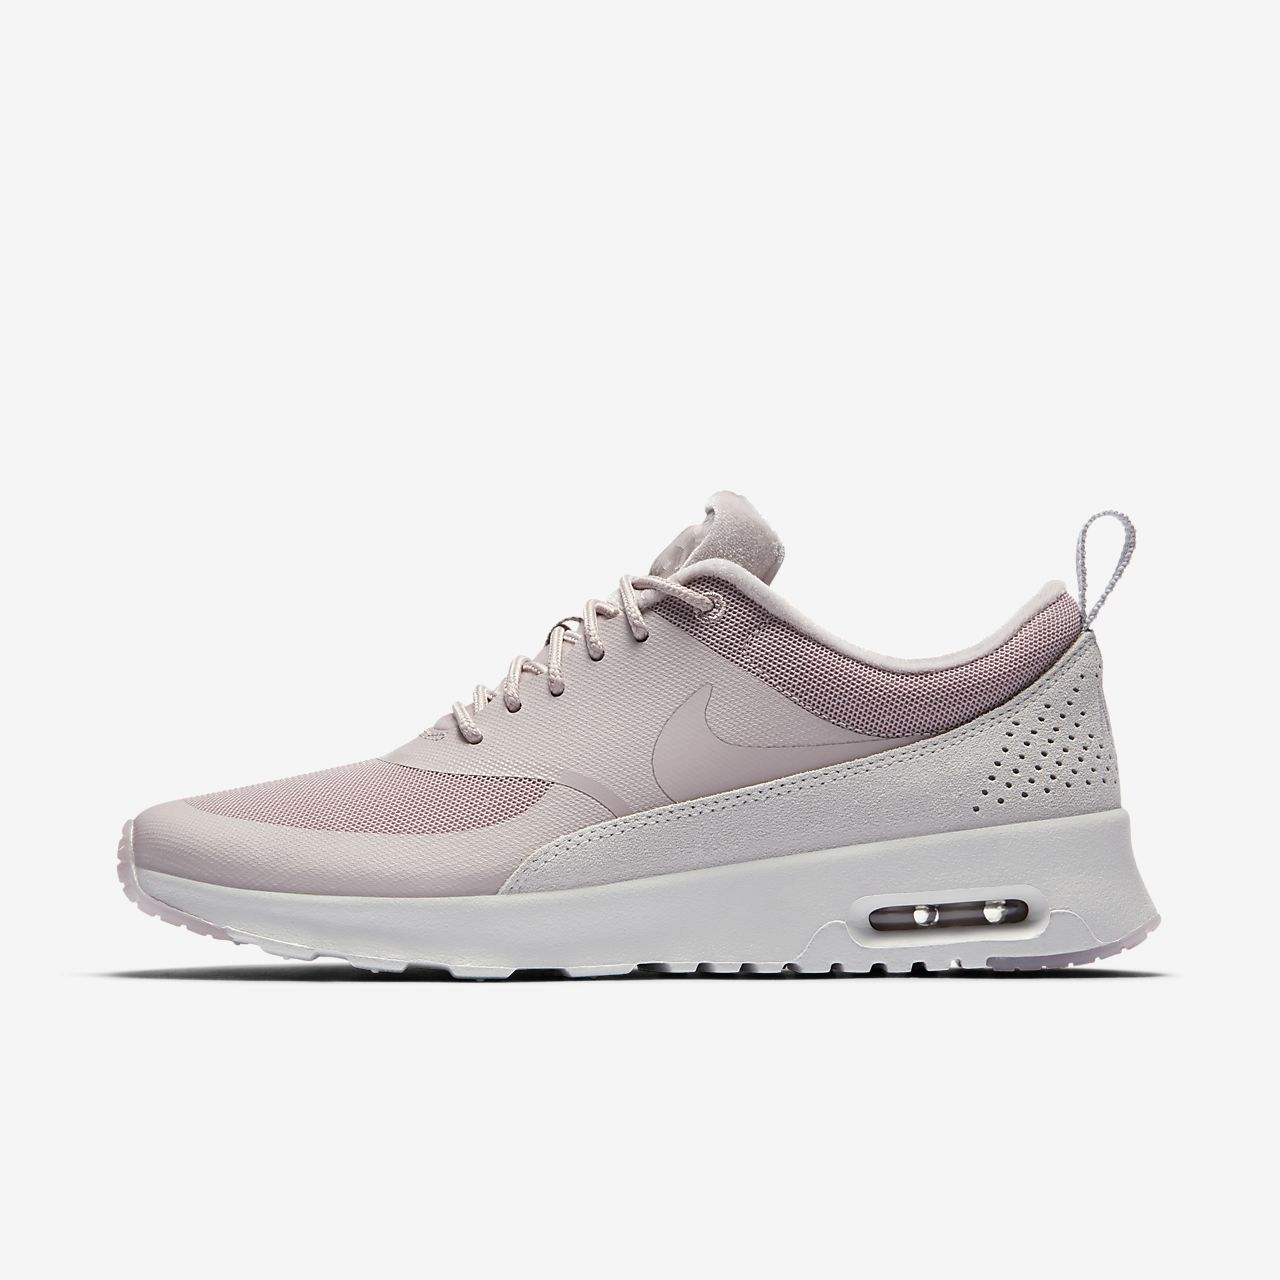 Chaussures Nike de Femme Air Max Thea LX rose | nike